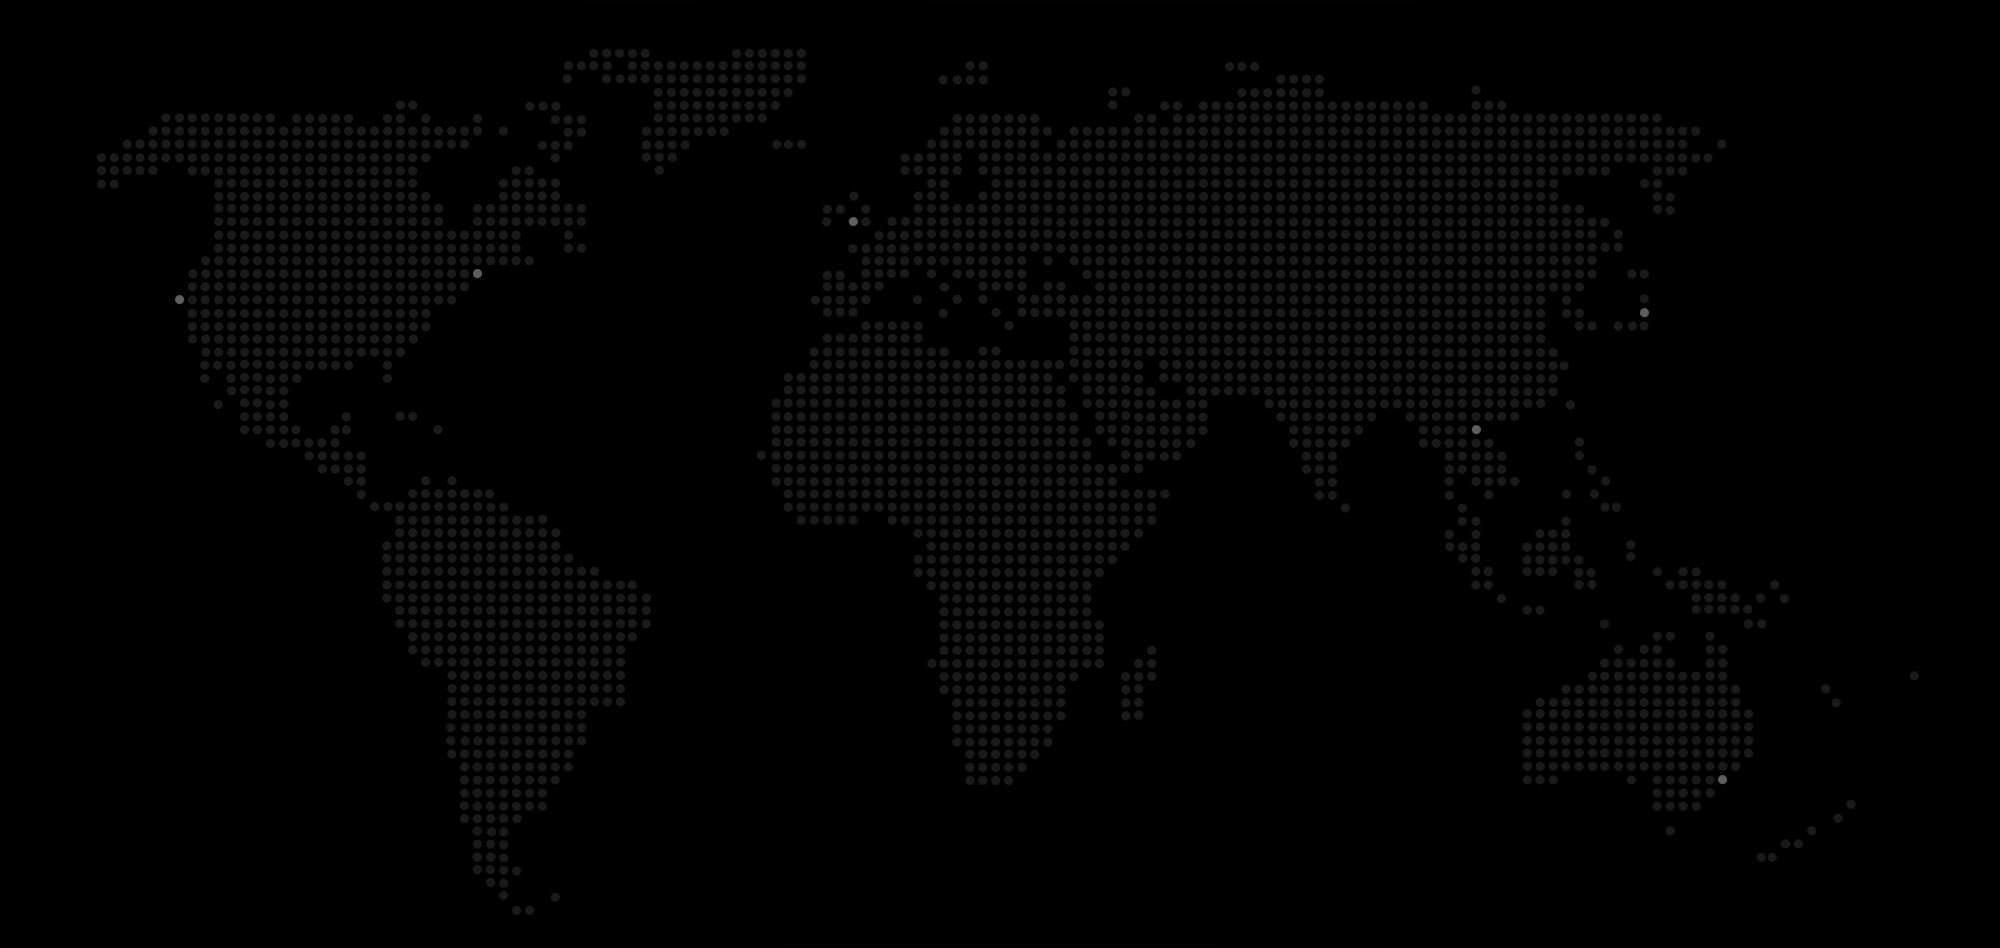 Black World Map Backgrounds - Wallpaper Cave